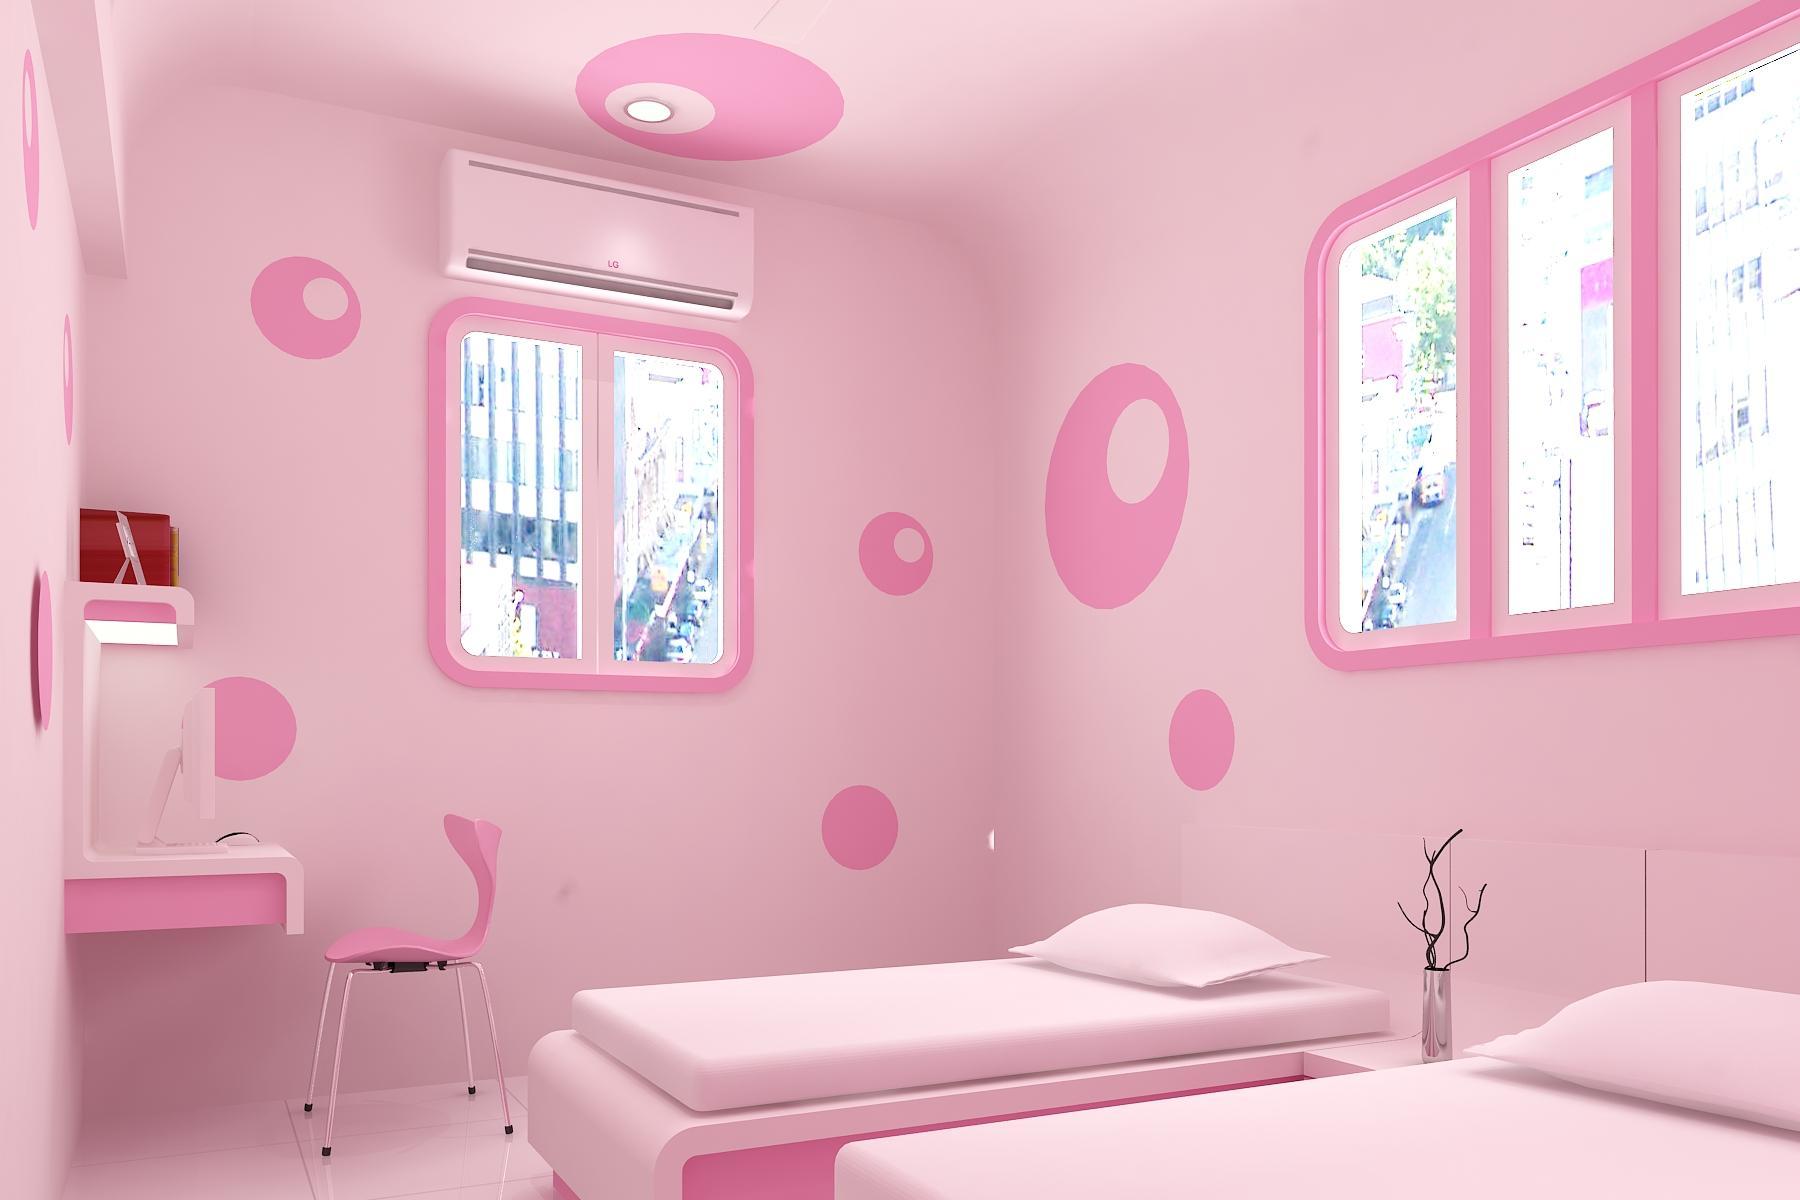 بالصور غرف اطفال بنات , صور تصميمات غرف لارق واجمل بنوته 3640 5